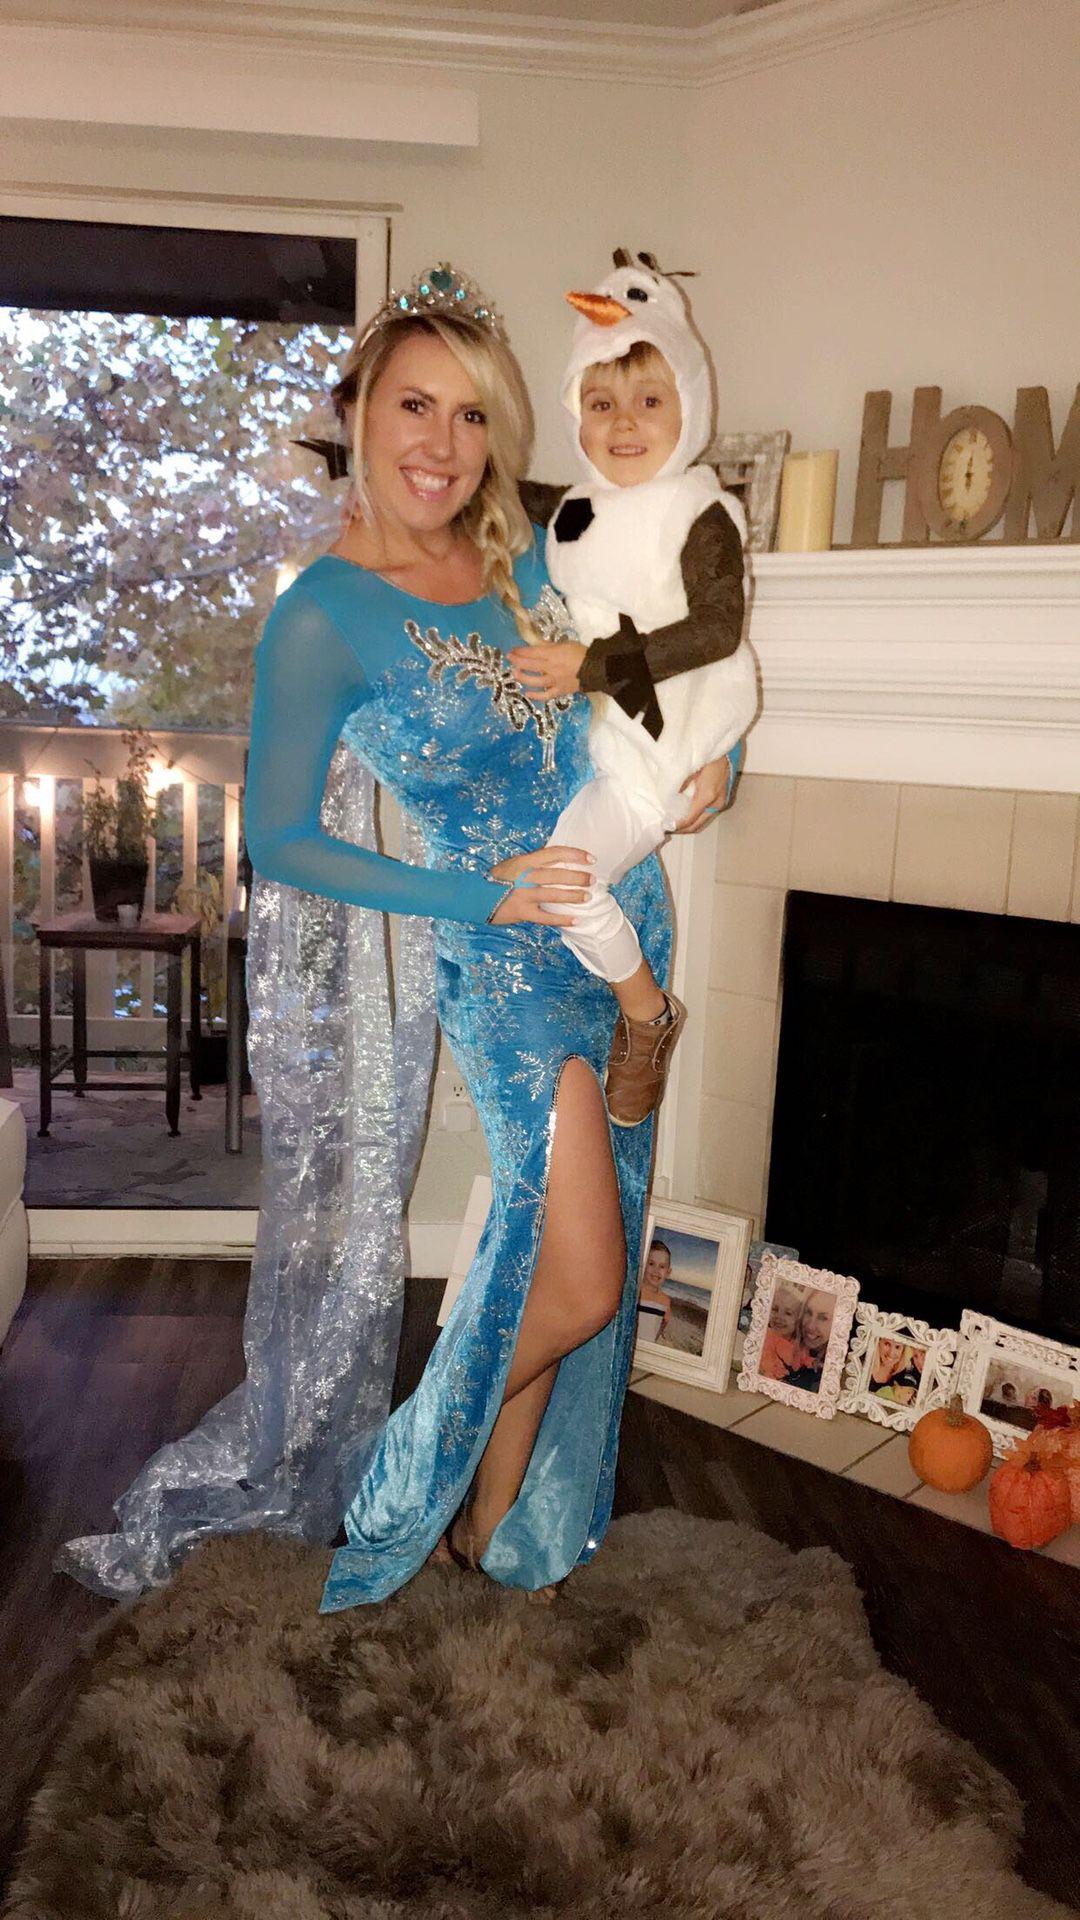 Disney Olaf costume